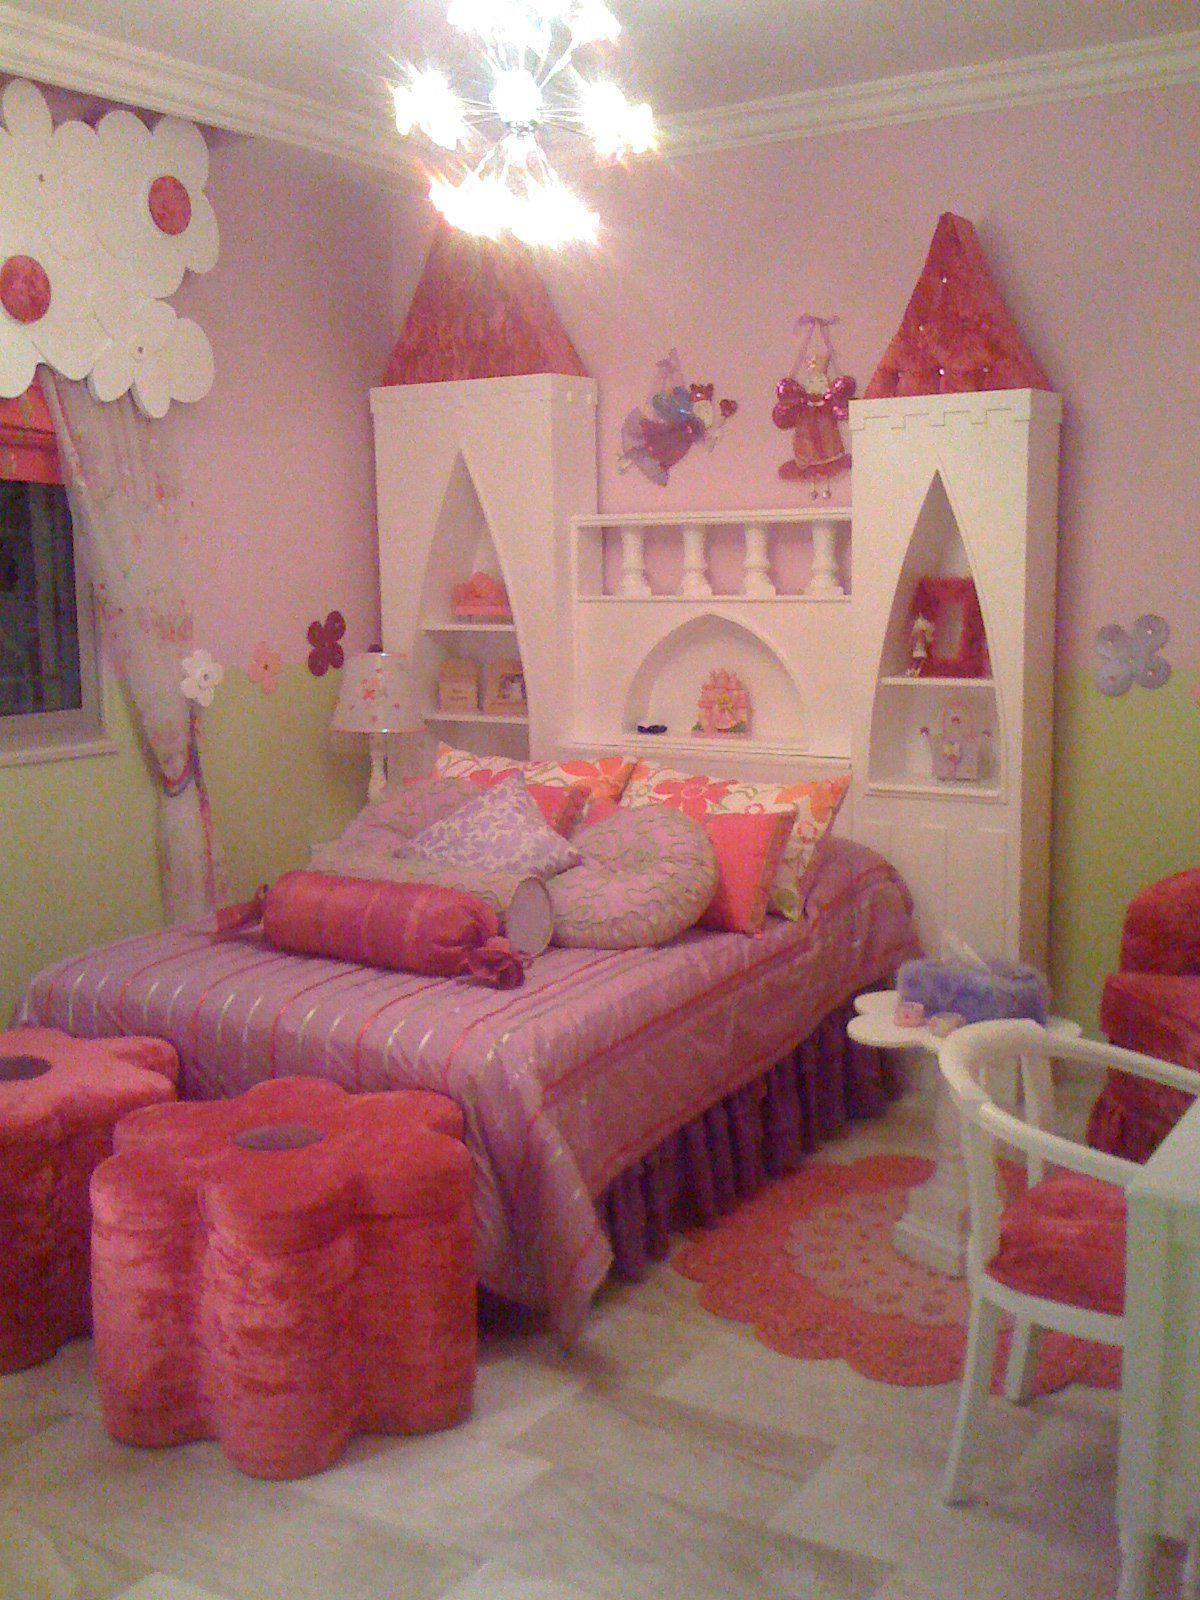 Princess Room Designs: Princess Room Decor, Castle Bed